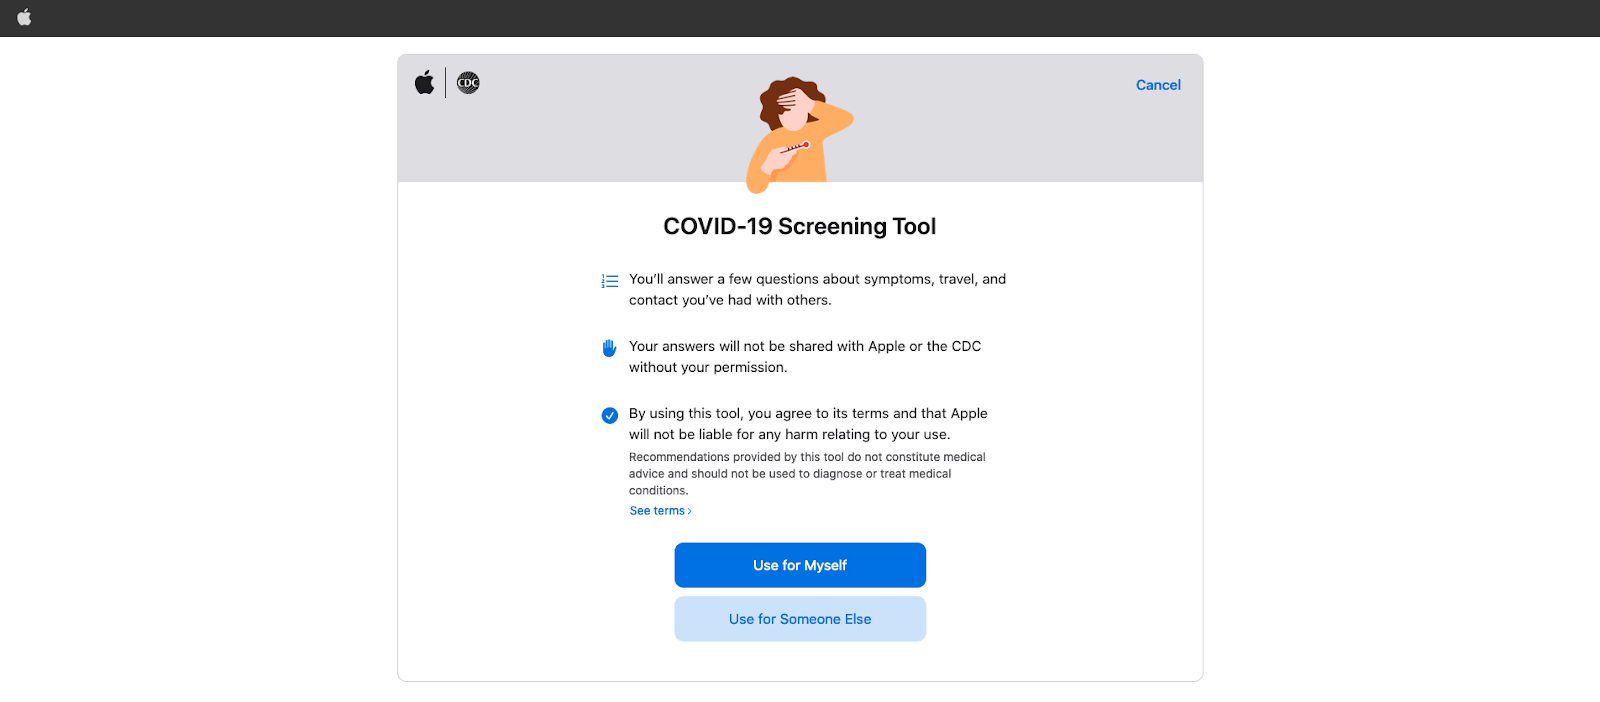 COVID-19 screening tool on the Apple website